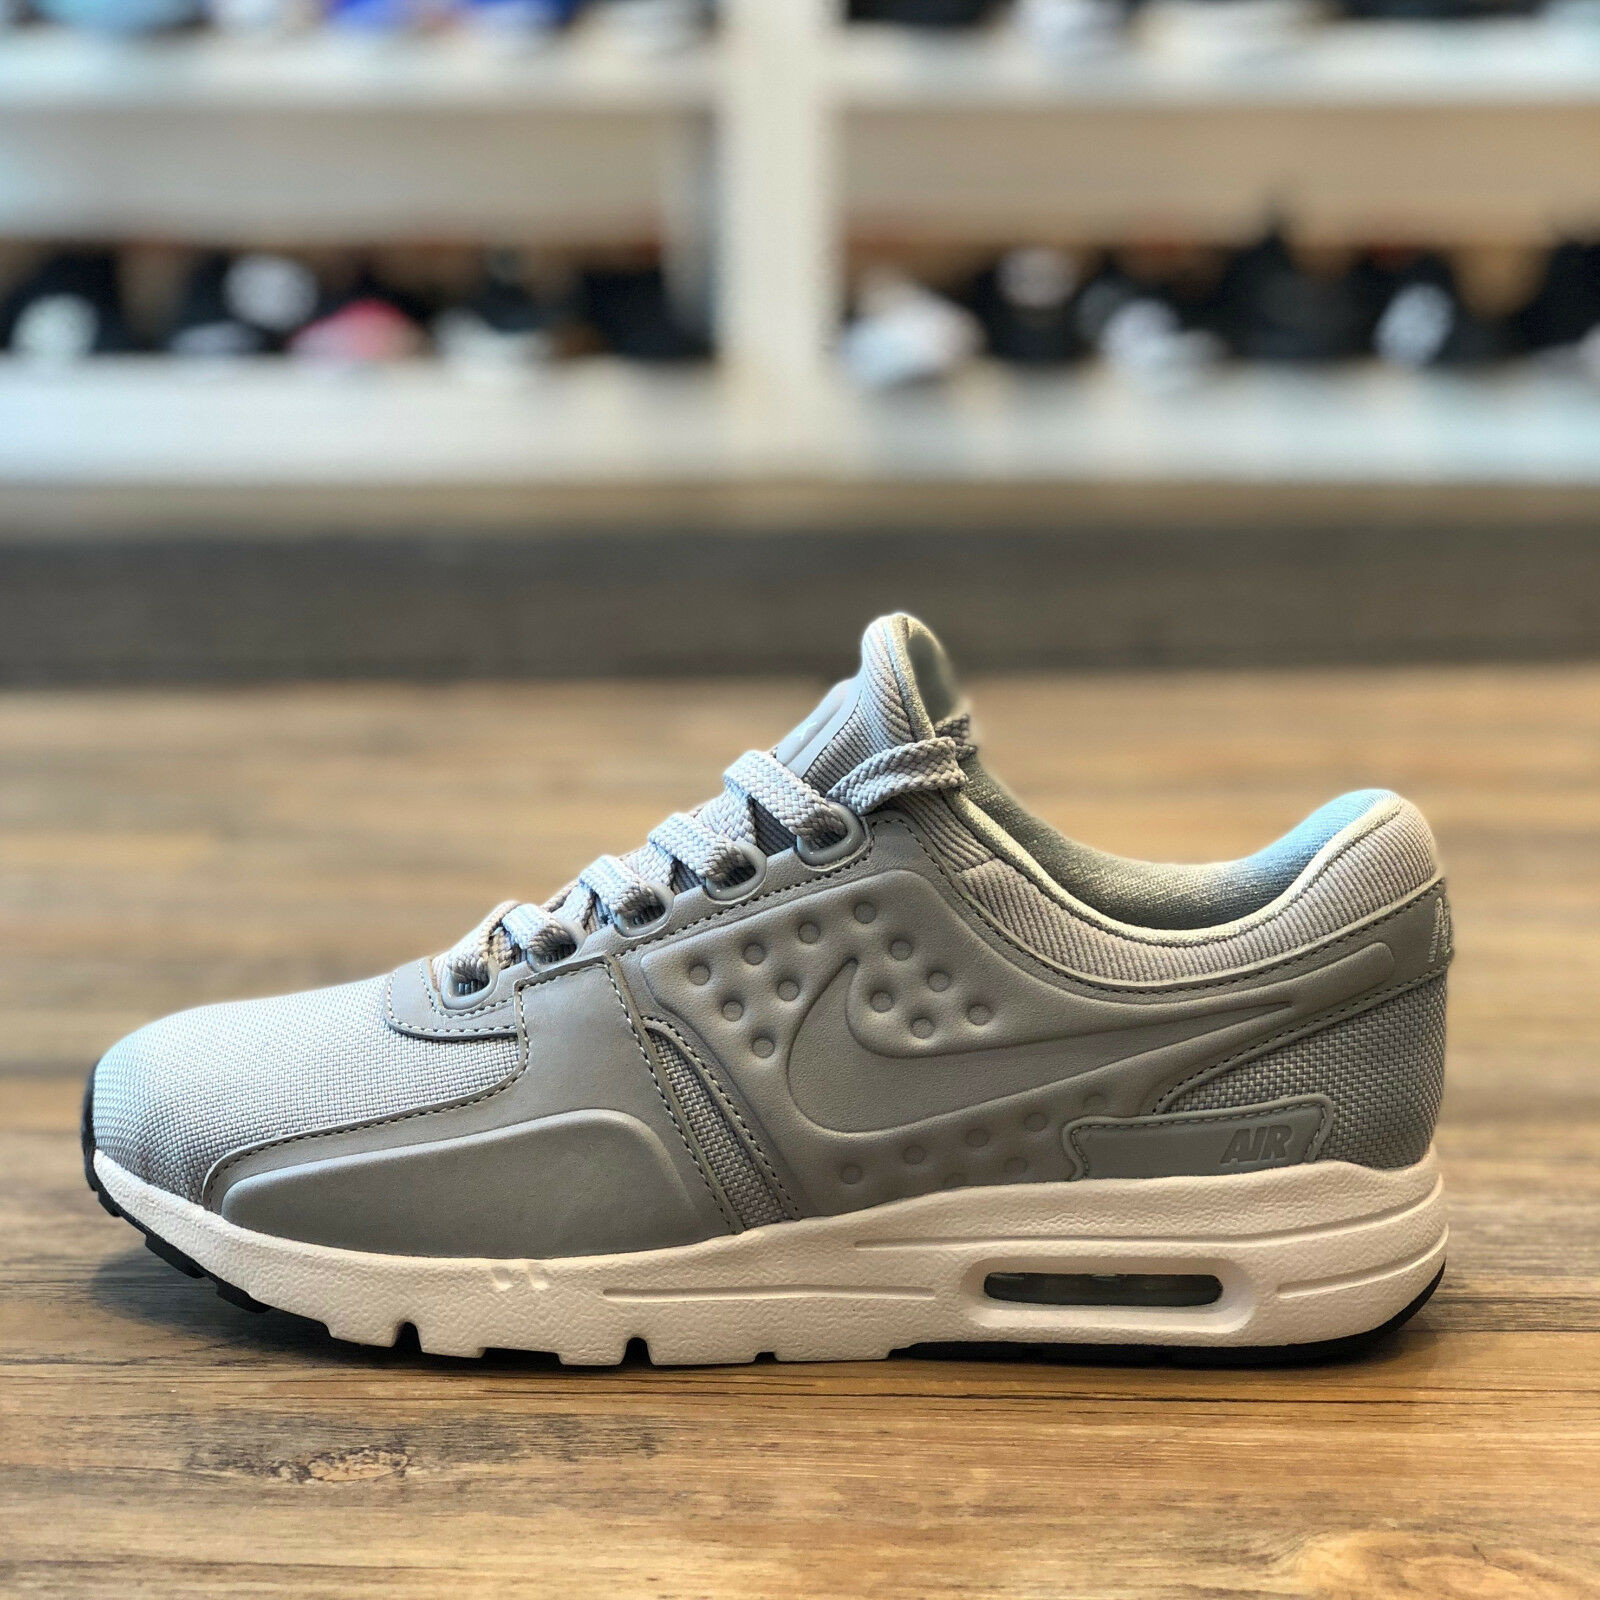 the latest ac7b3 b6f73 Nike Air Air Air Max Zero taille 38 Chaussures Sneaker Sport Fitness Femmes  90 1 Neuf 890199 004 f29c6b